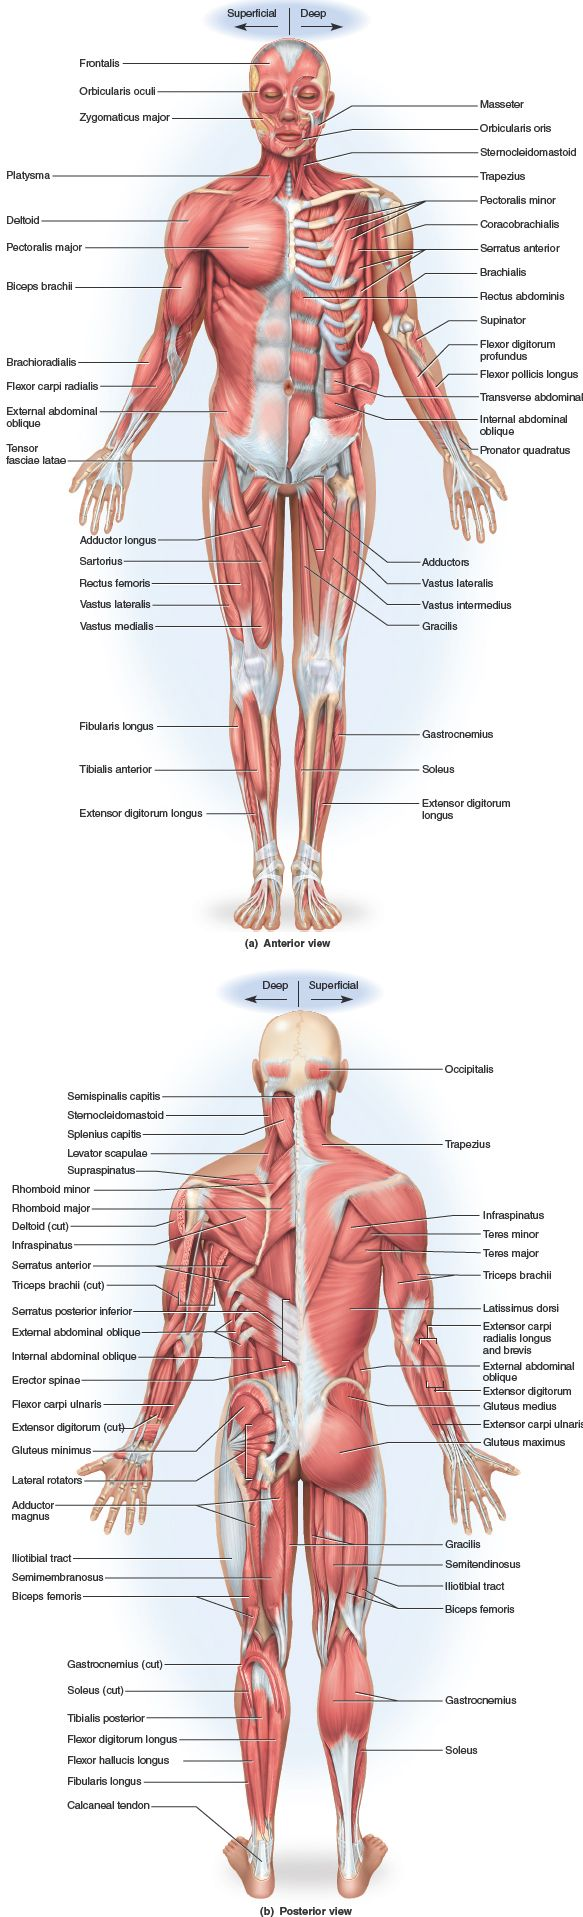 103 best Anatomy images on Pinterest | Human anatomy, Anatomy and ...